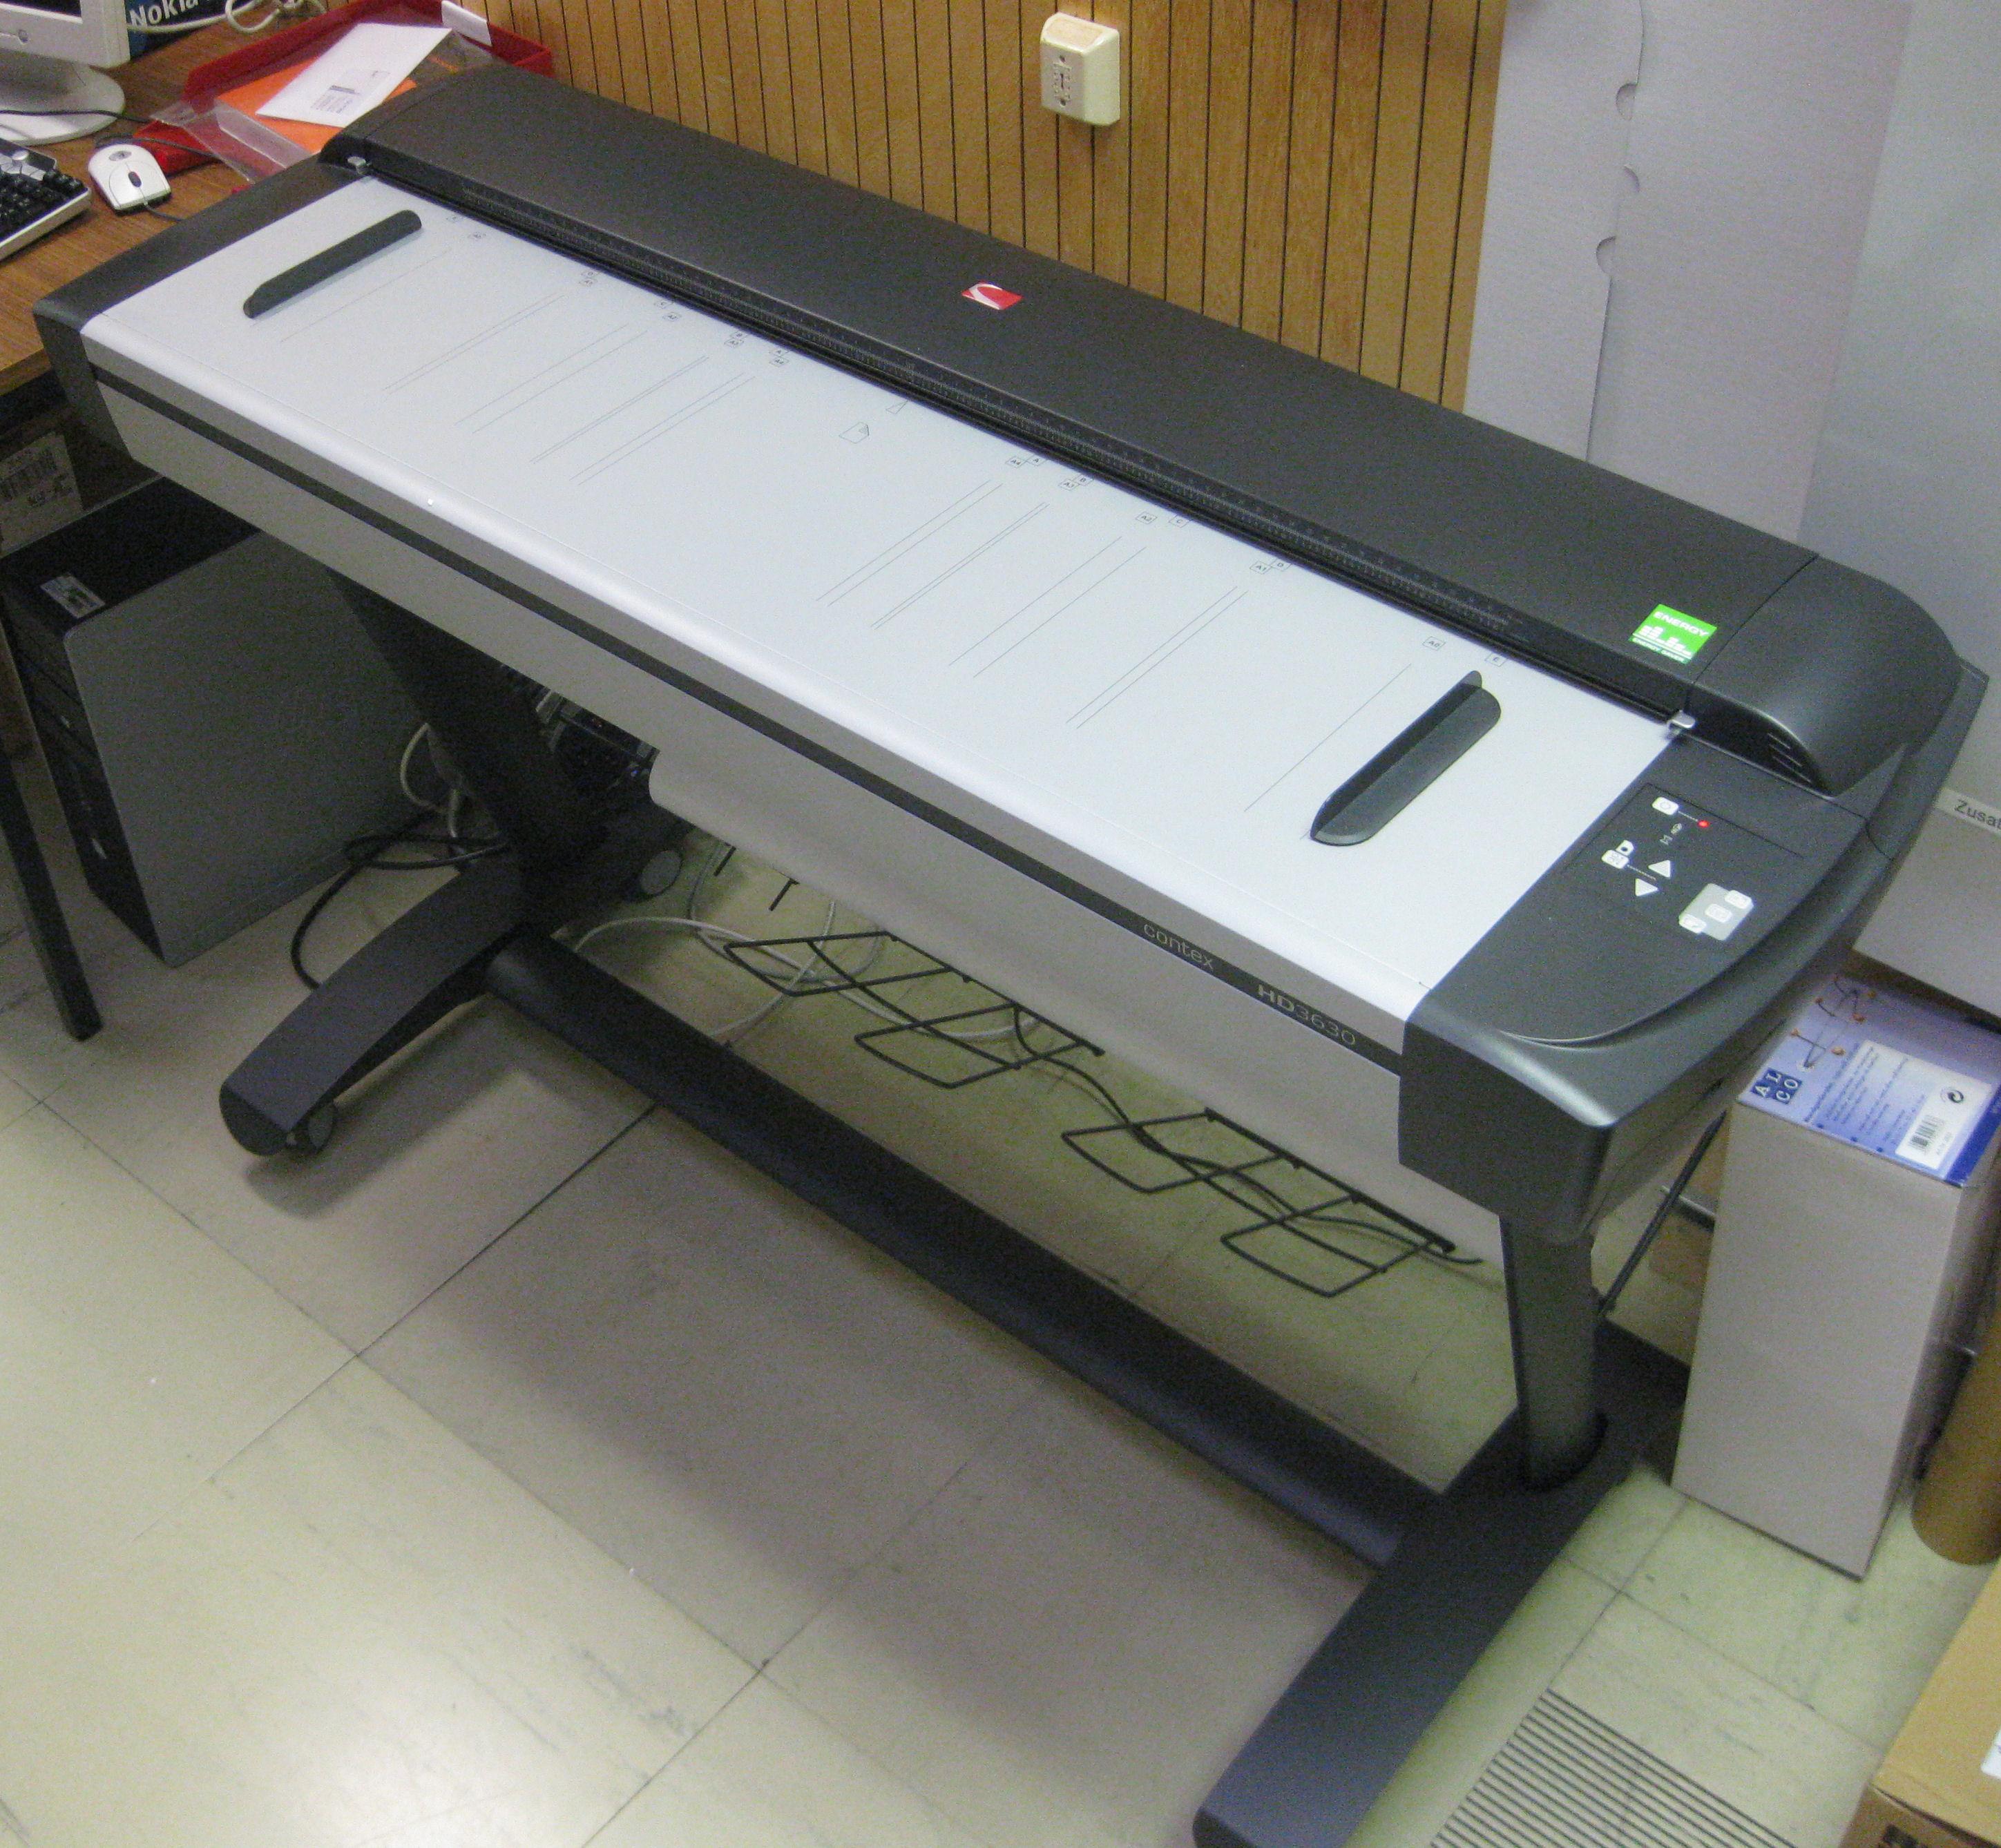 scanner contex hd 3630